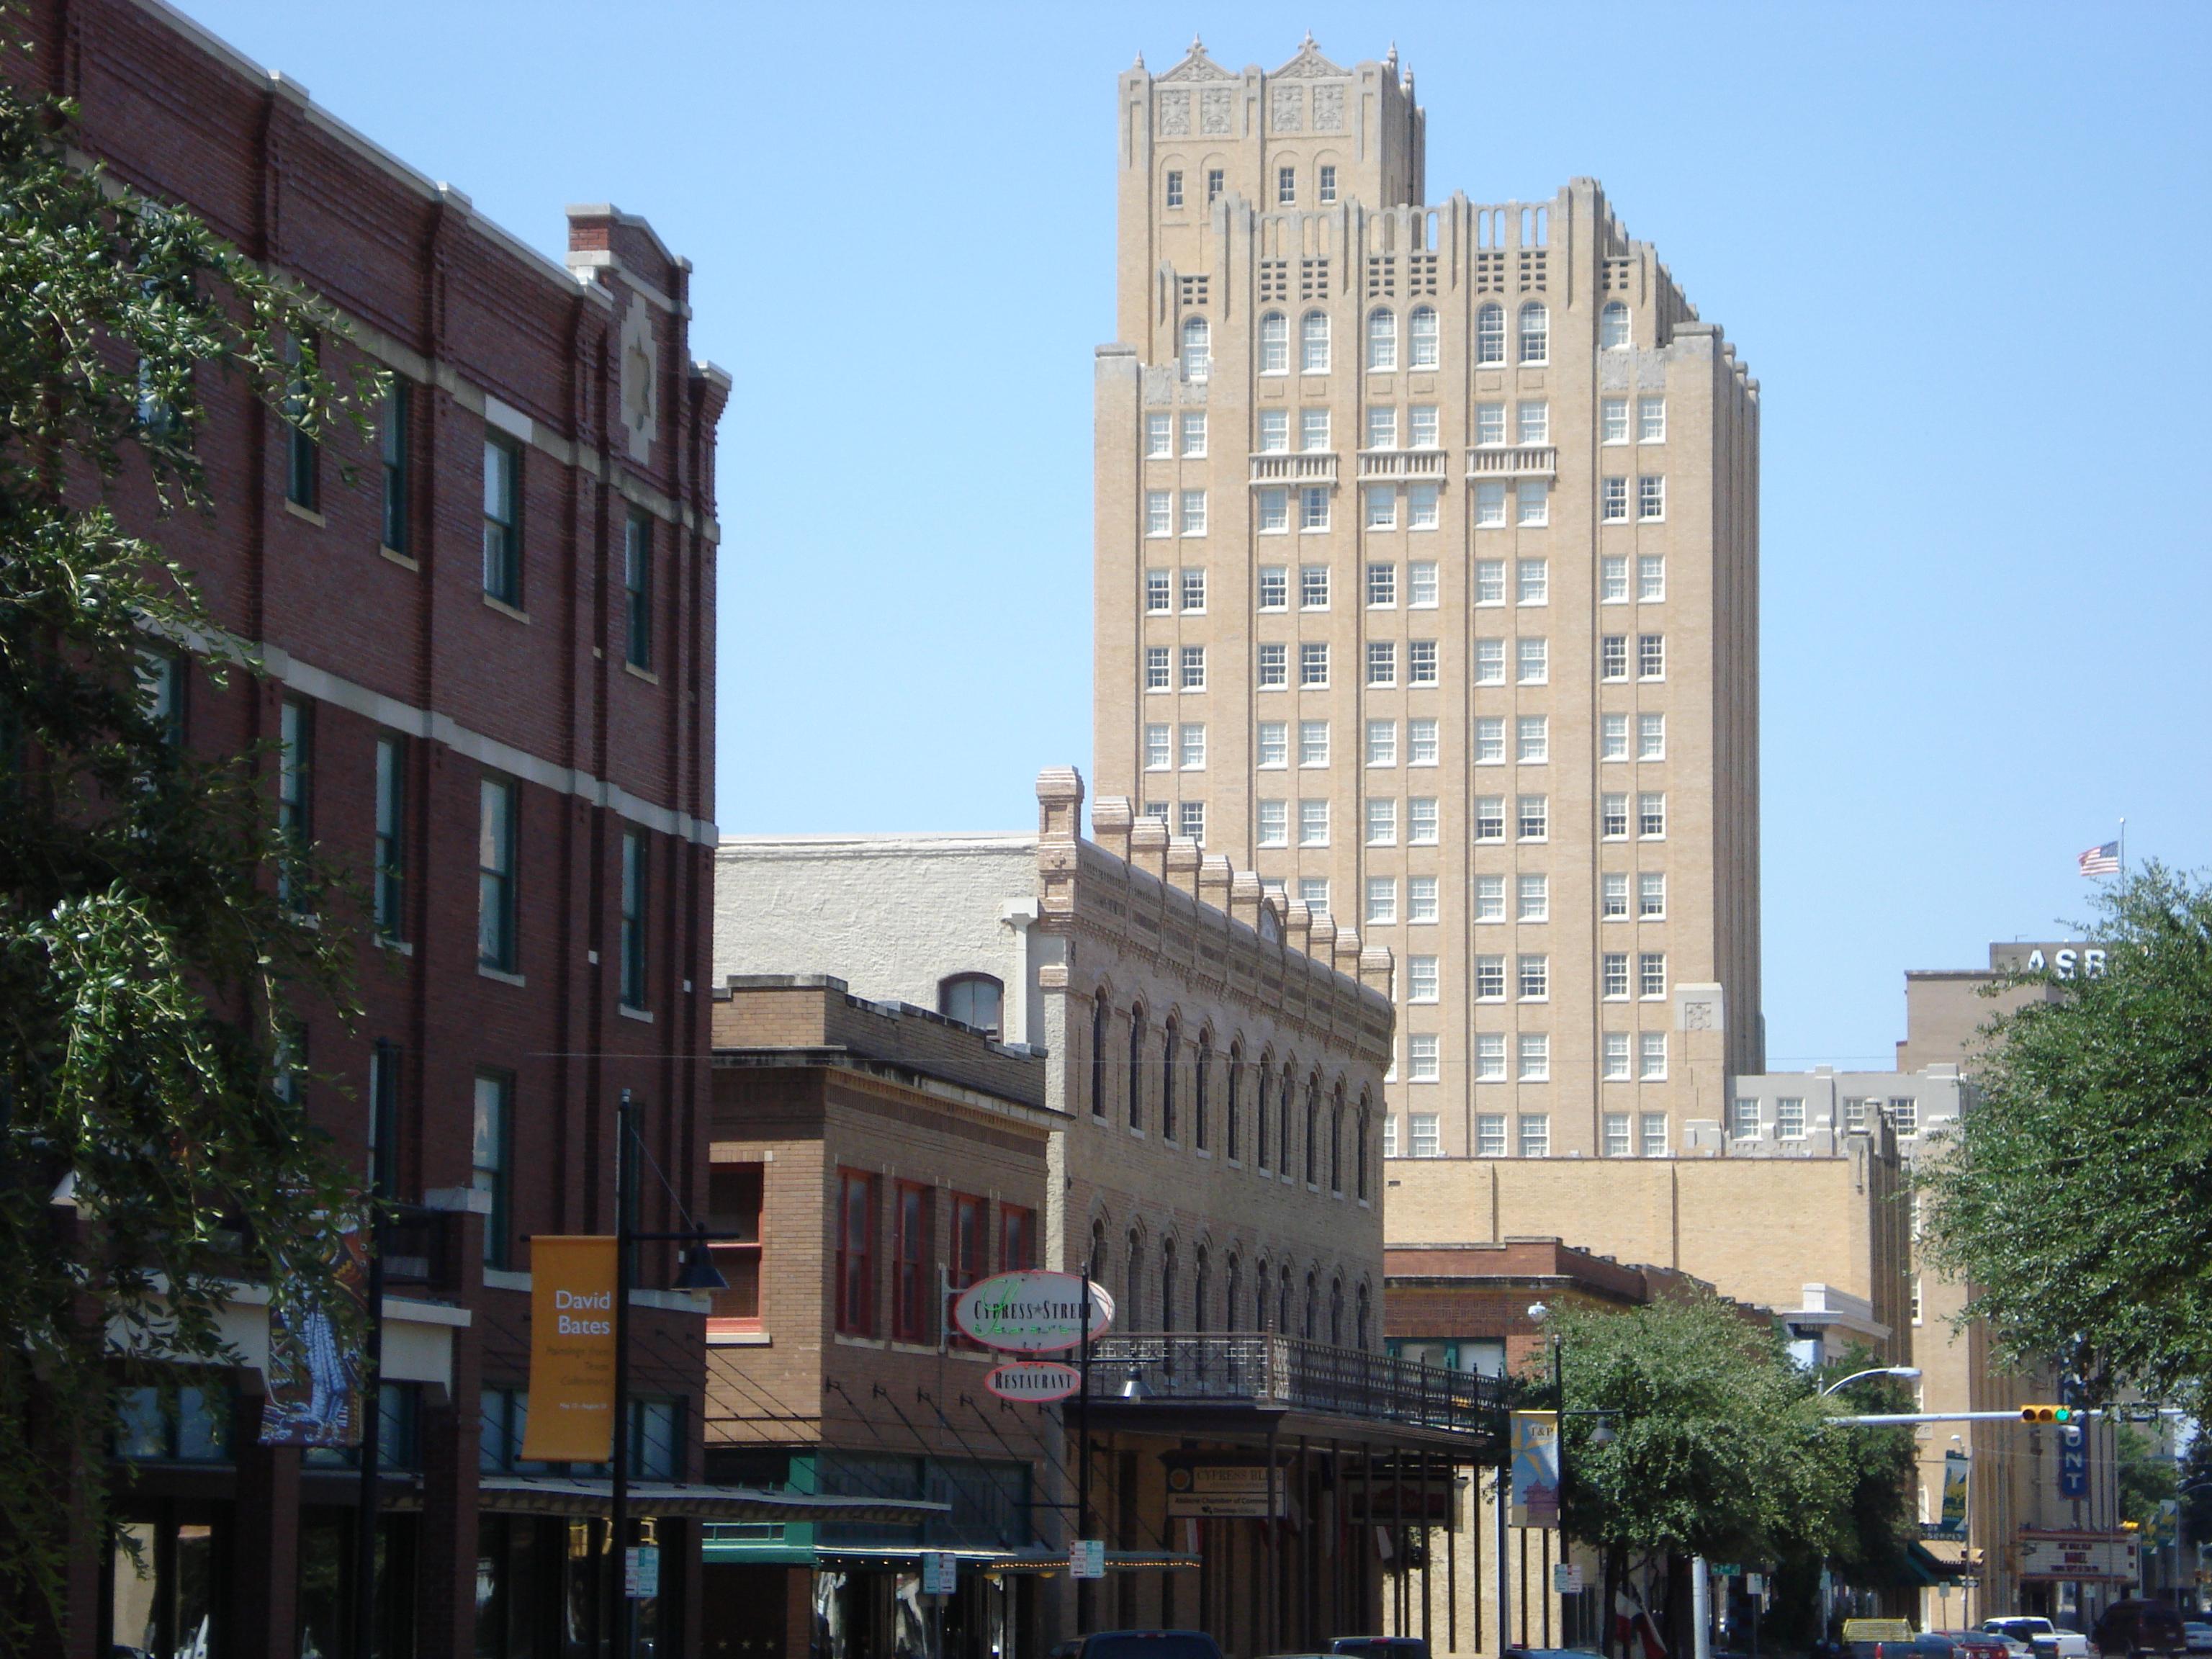 Abilene, TX - Commercial Real Estate - LMB Property Management